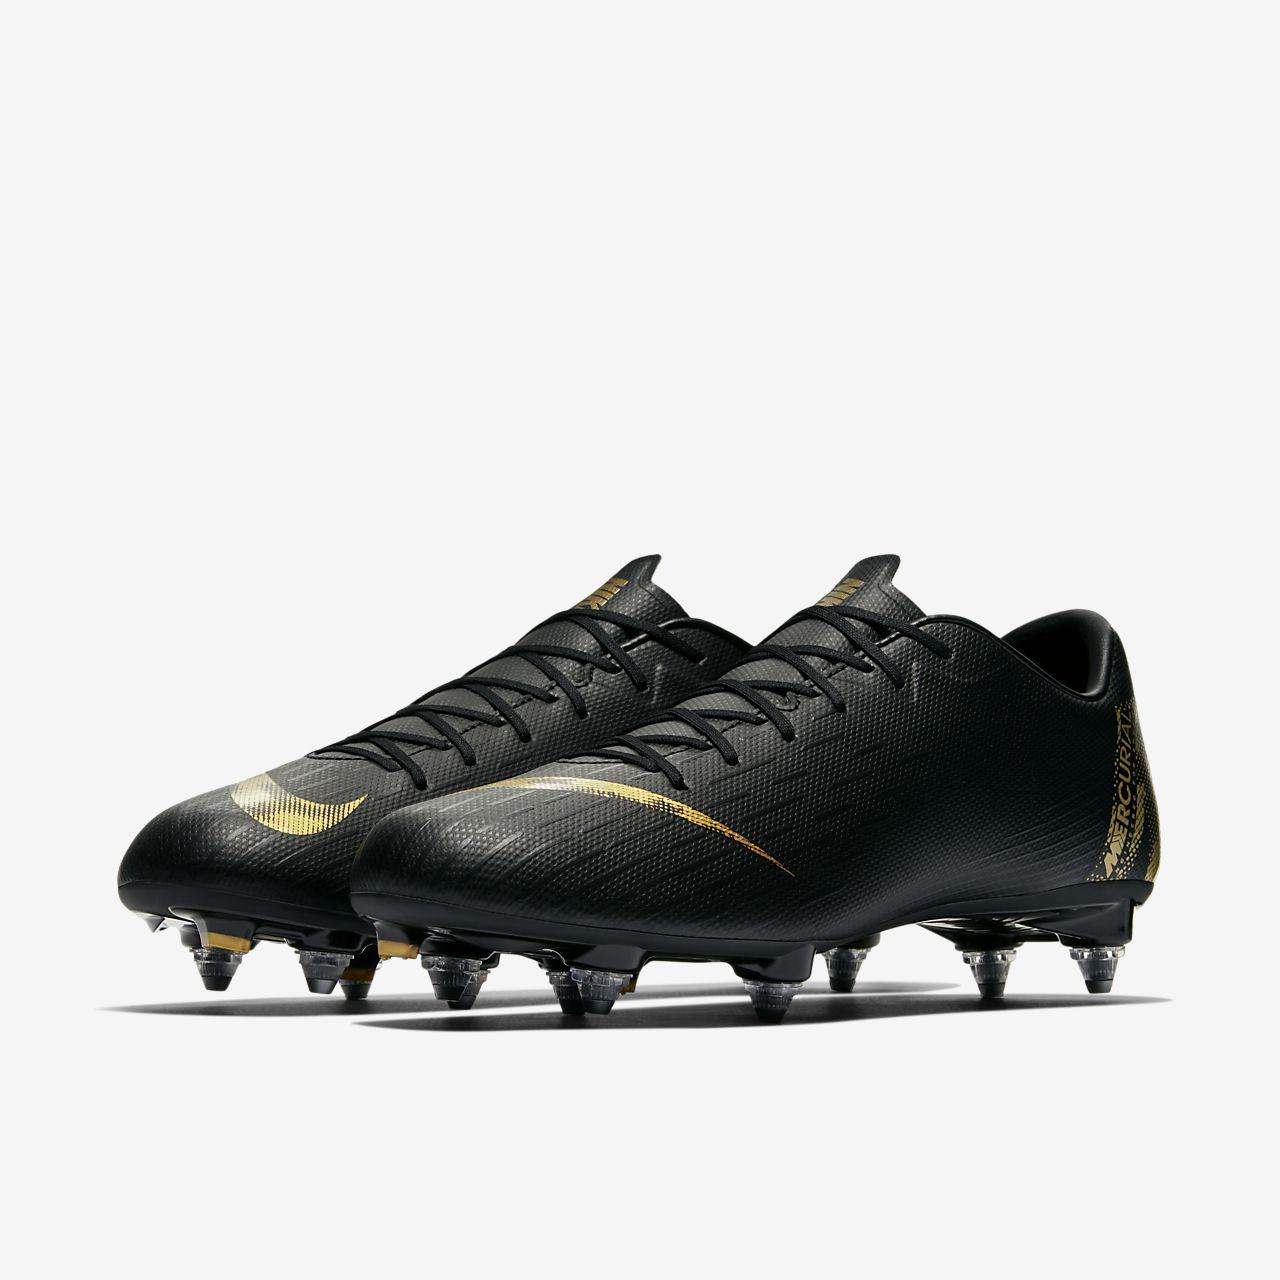 f55458a060171 Nike Mercurial Vapor XII Academy SG-PRO Soft-Ground Football Boot ...